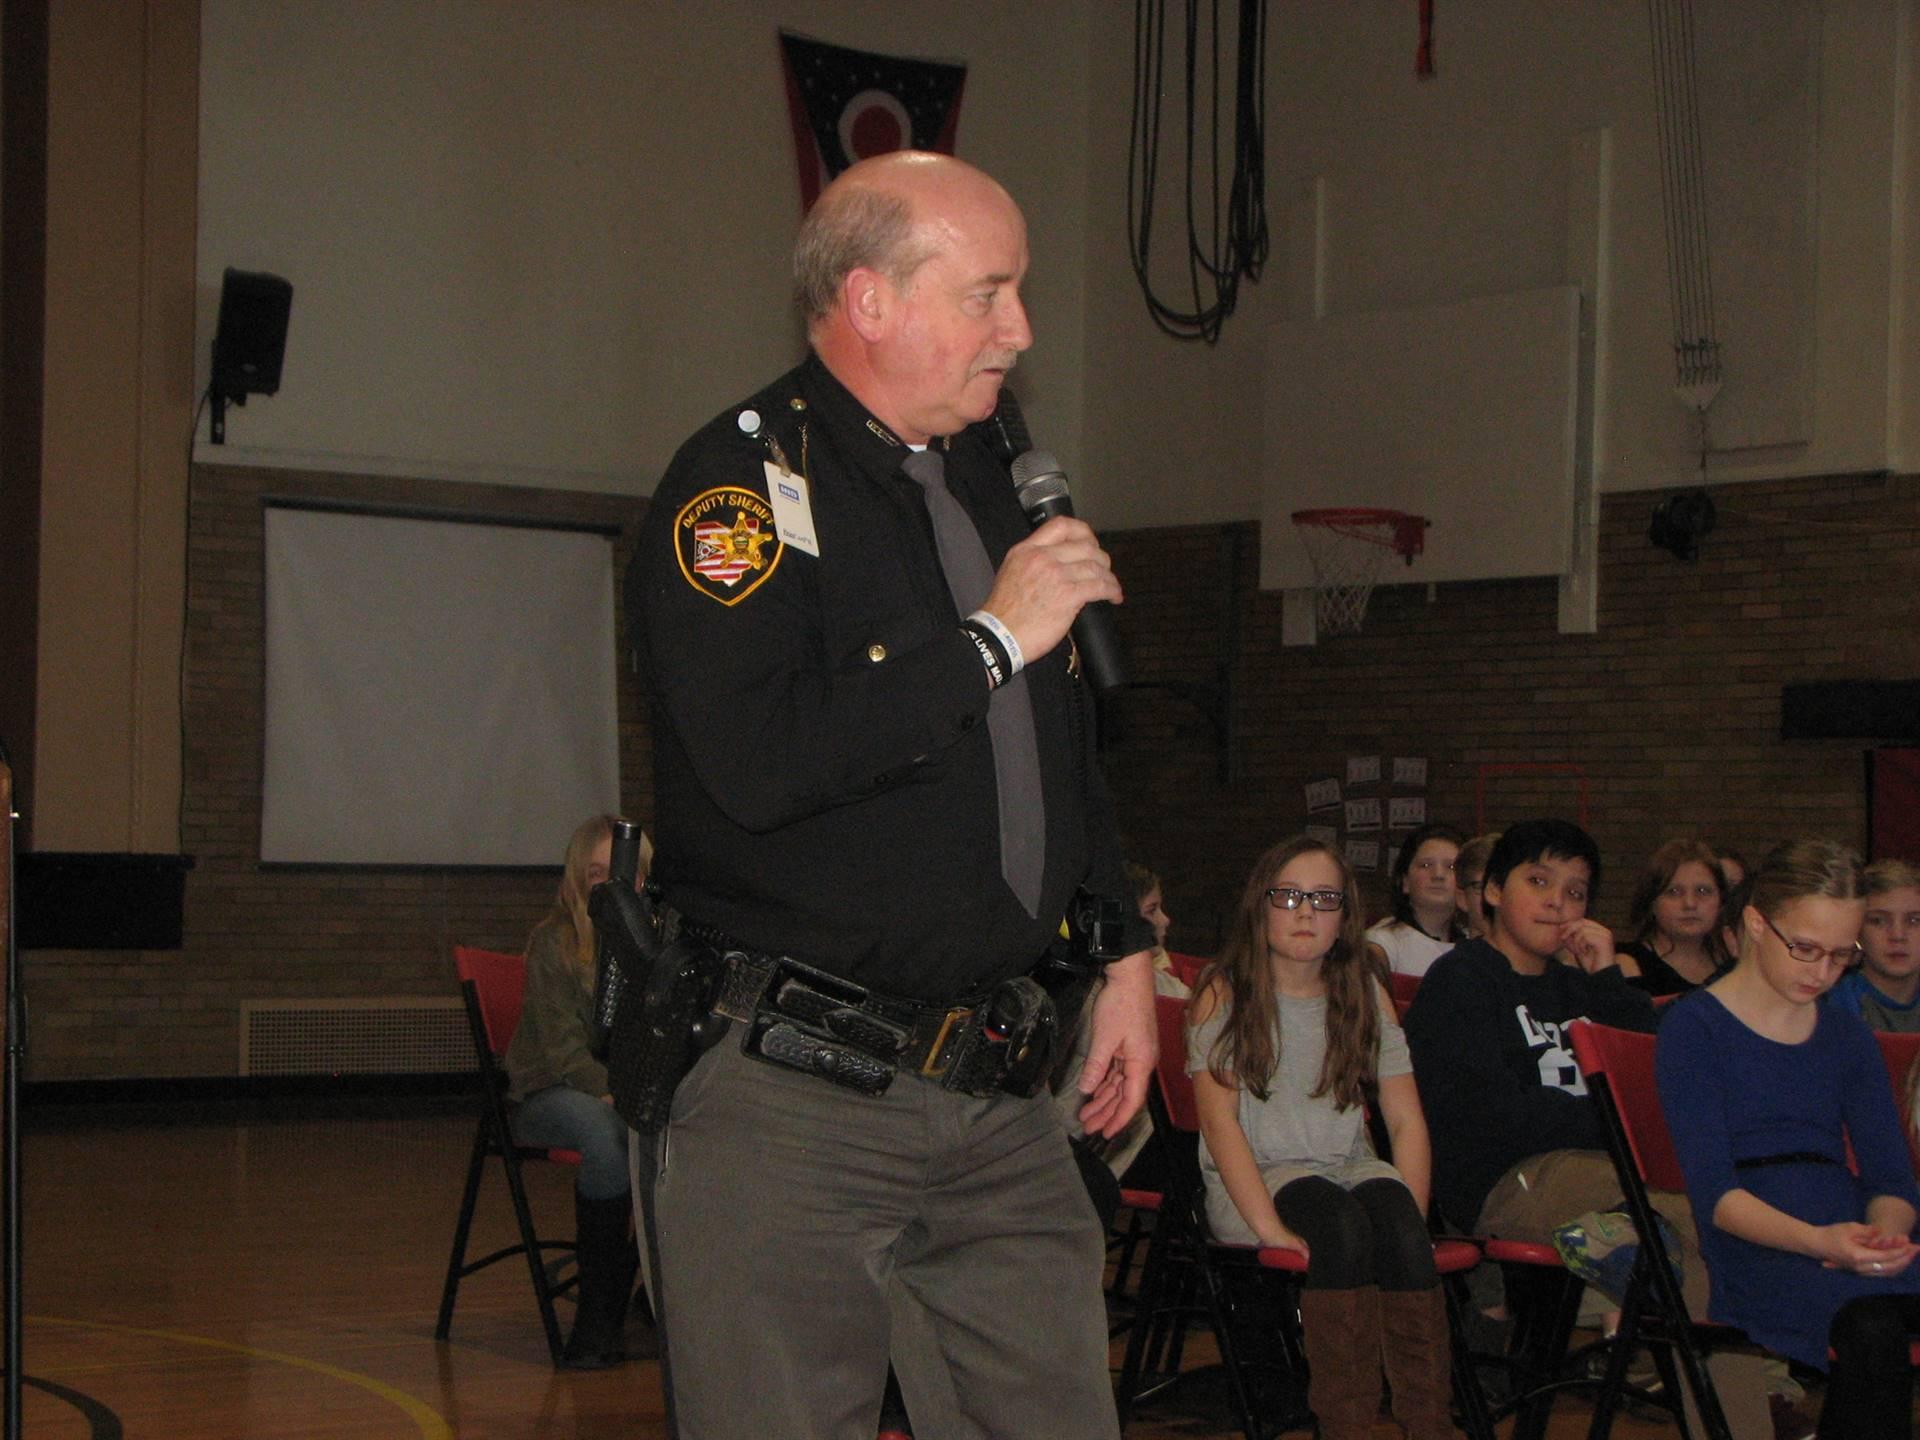 Deputy Lundstrom